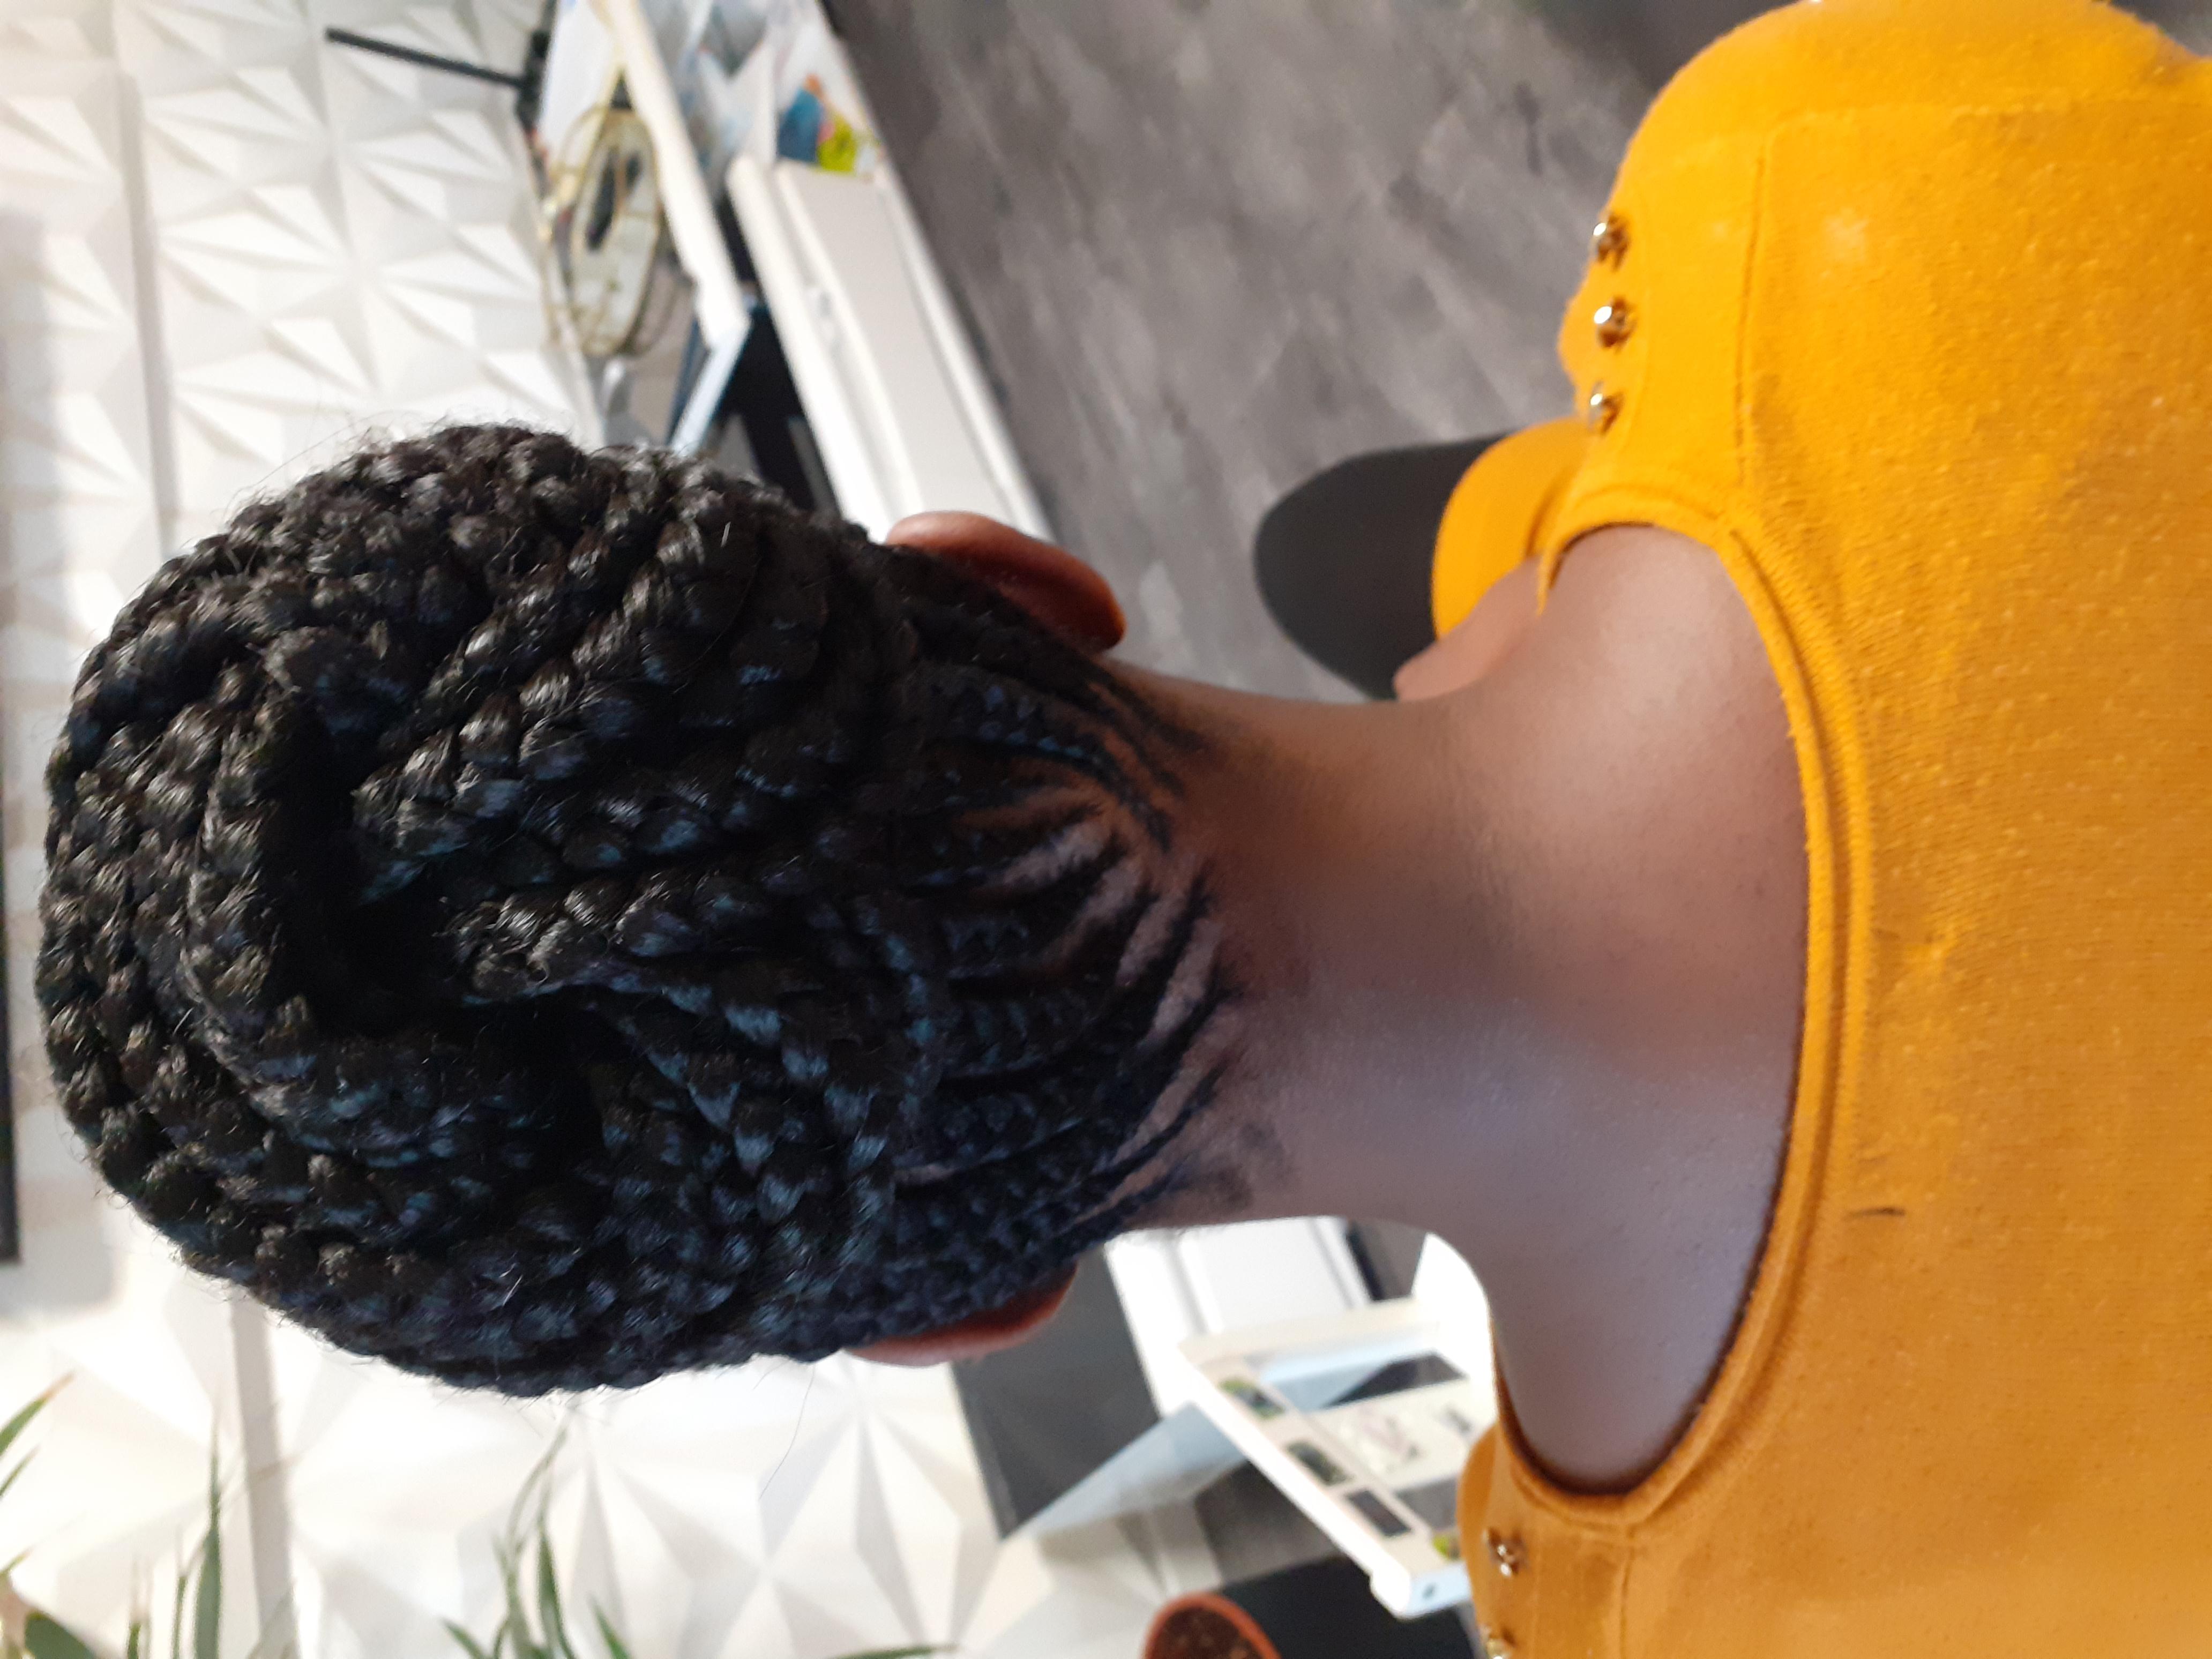 salon de coiffure afro tresse tresses box braids crochet braids vanilles tissages paris 75 77 78 91 92 93 94 95 UIAXGNUU